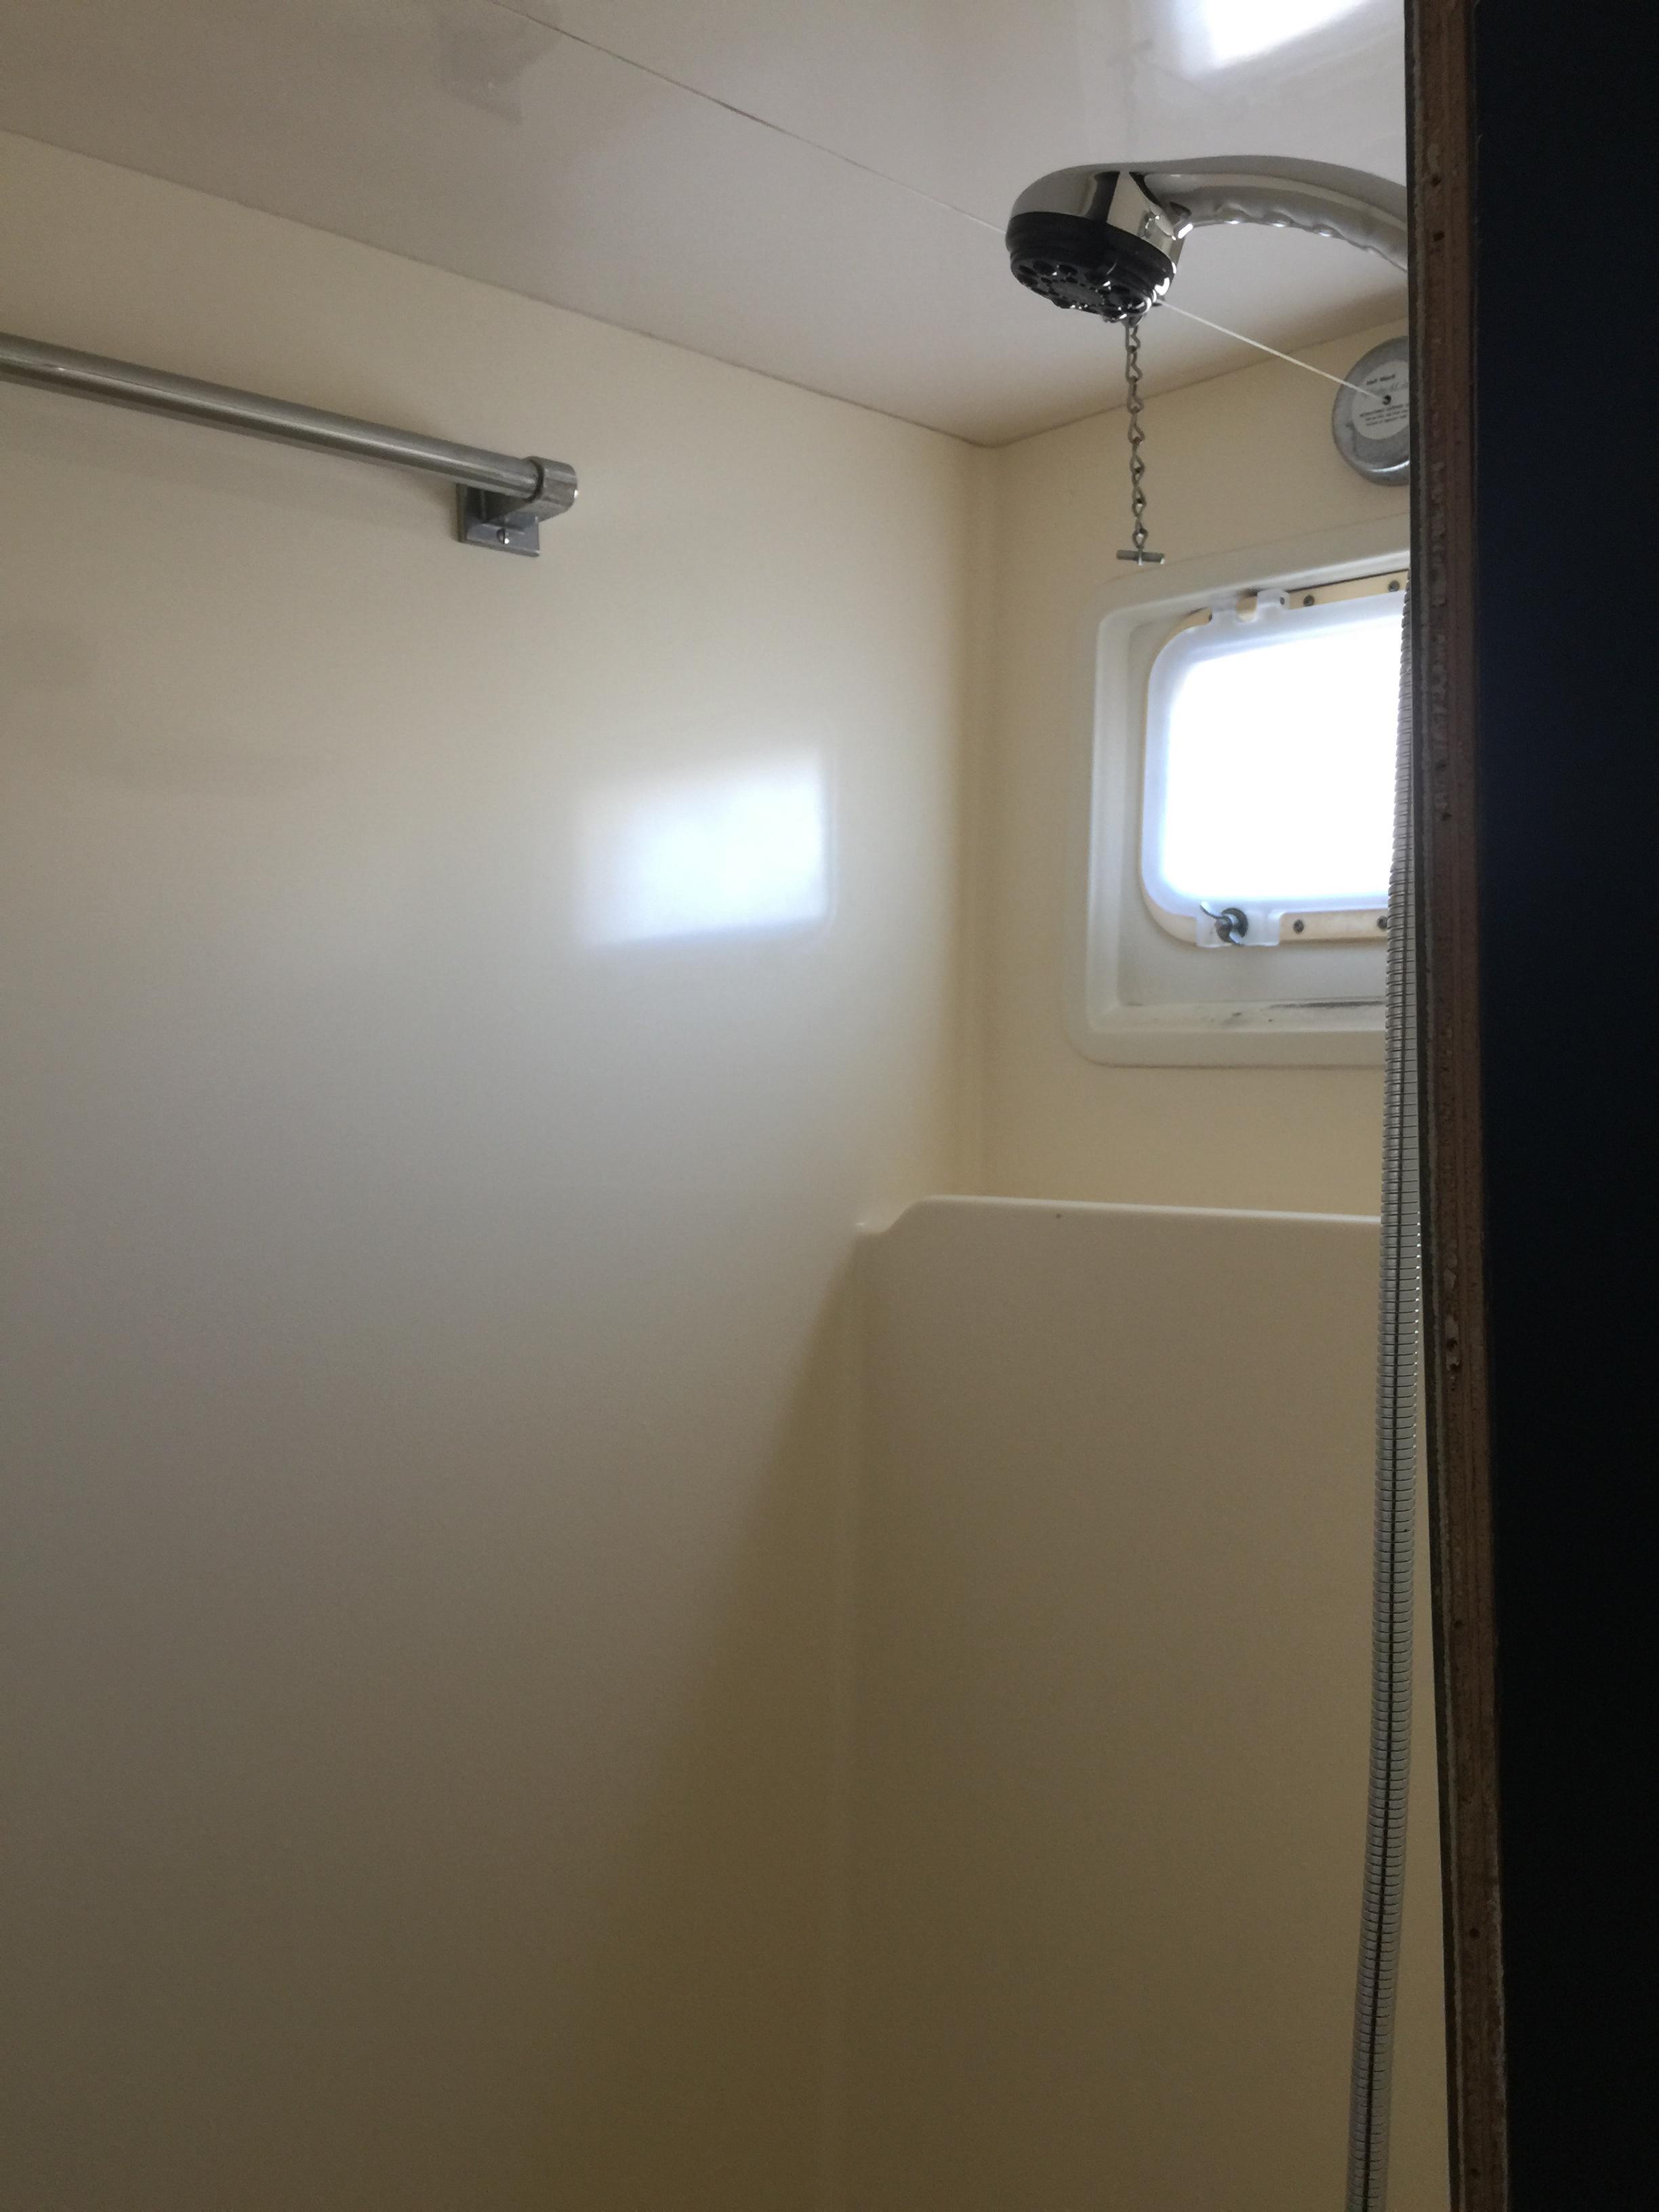 Forward Stateroom Shower